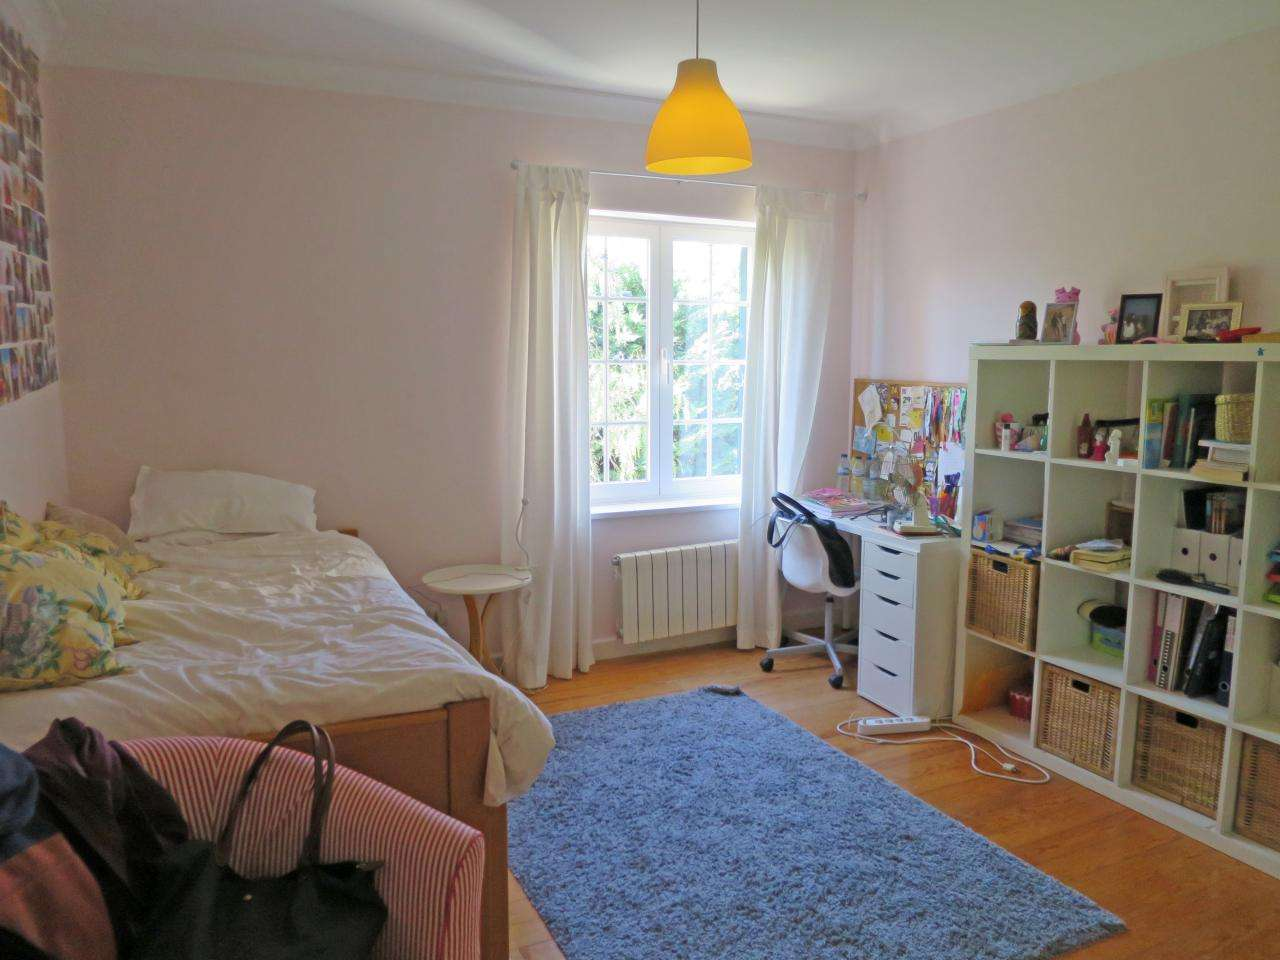 Moradia para arrendar, Alcabideche, Cascais, Lisboa - Foto 25